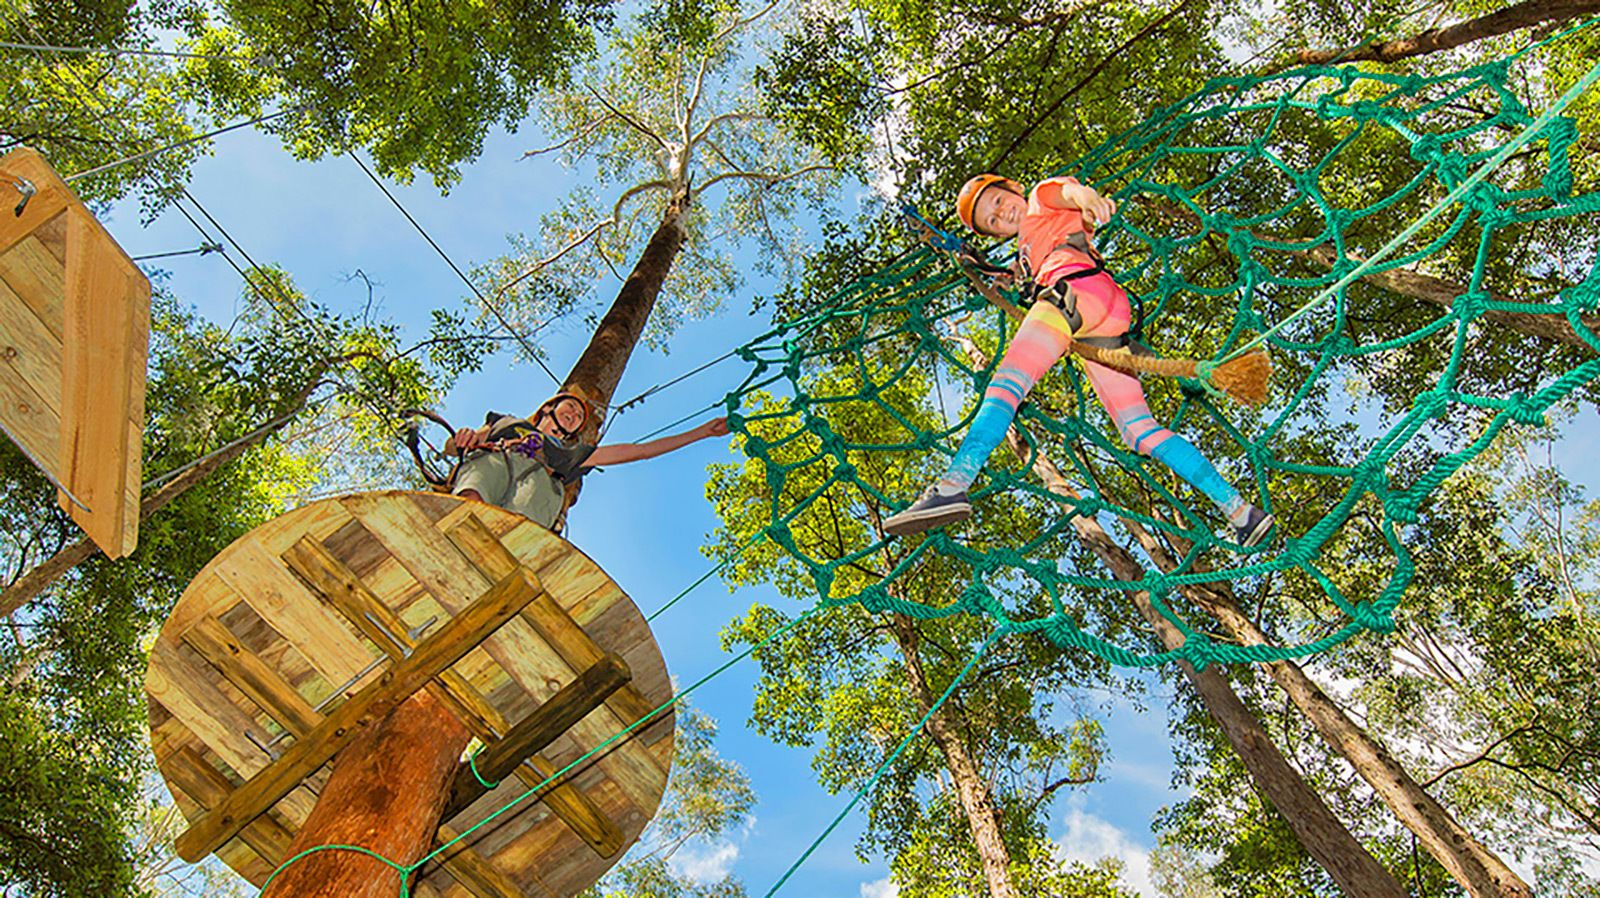 Raised platforms on a tree platform in an Adventure Park